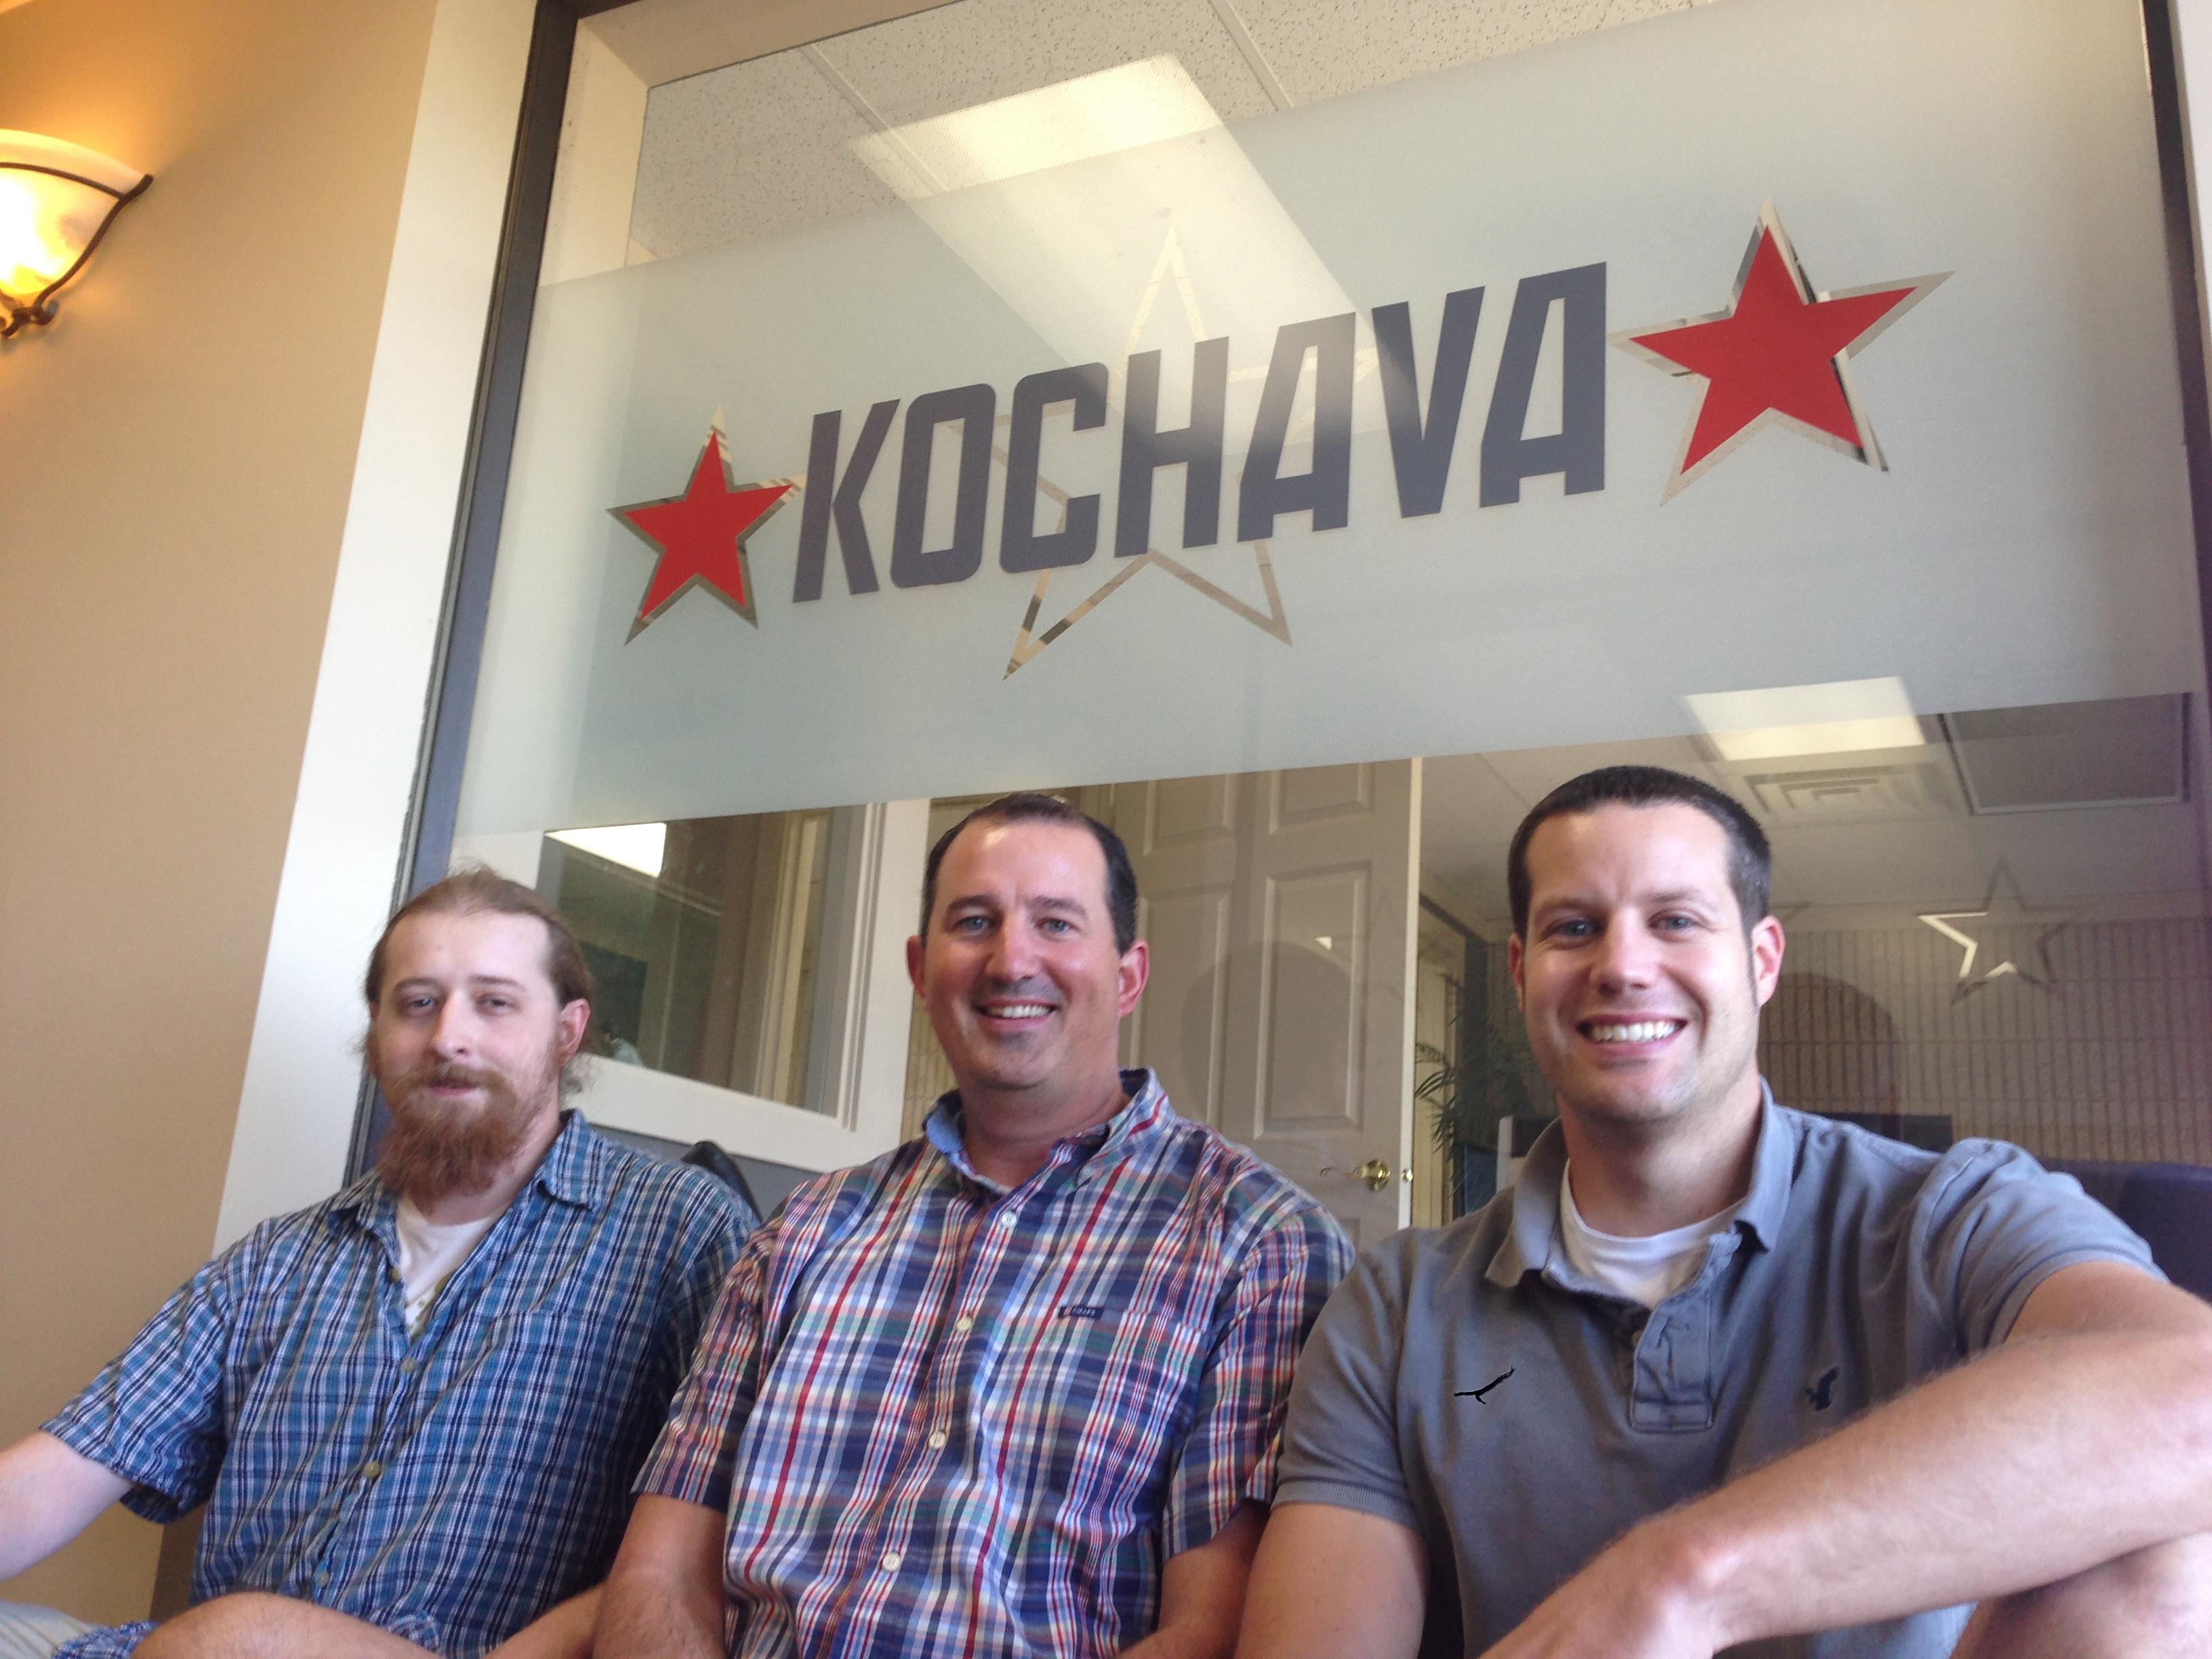 Kochava's new data scientists. From left: Noel Cower, Seth Samuels and Paul NIeman